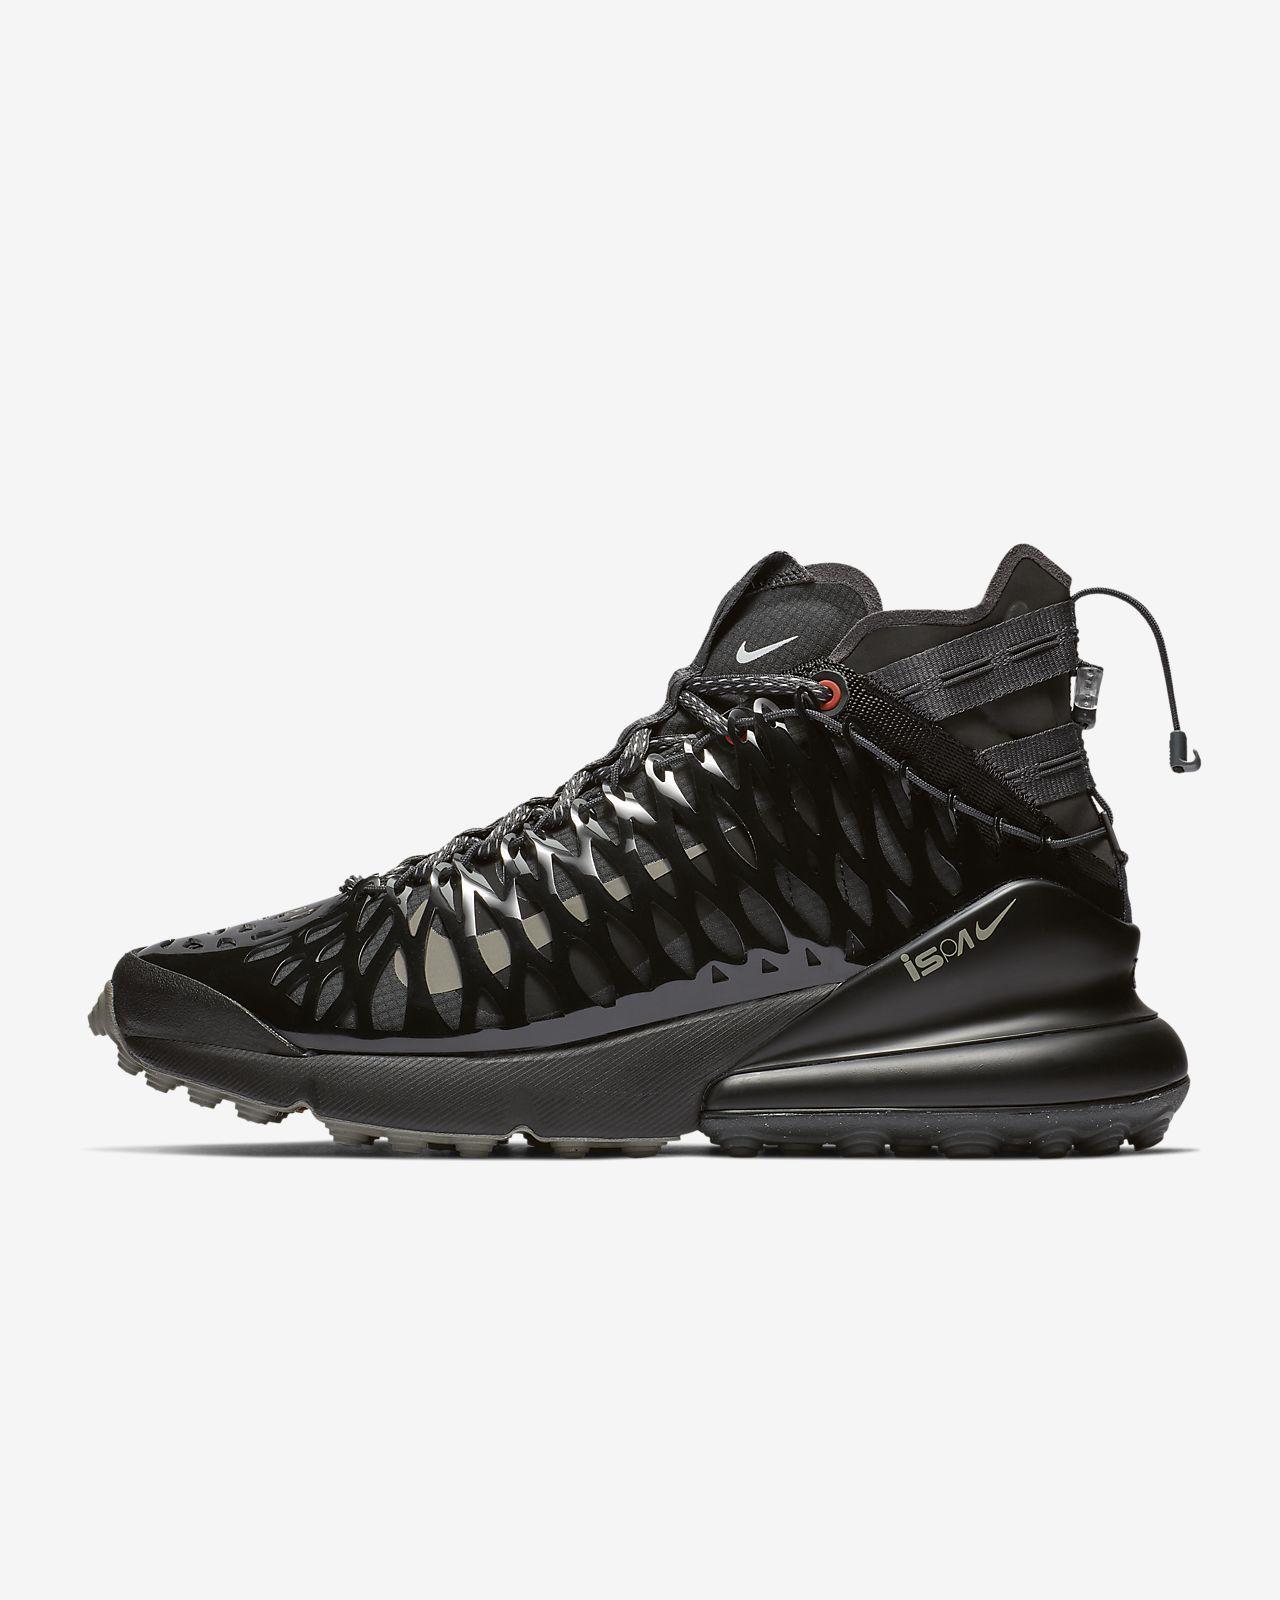 Nike Air Max 270 ISPA Men's Shoe | Nike shoes air max